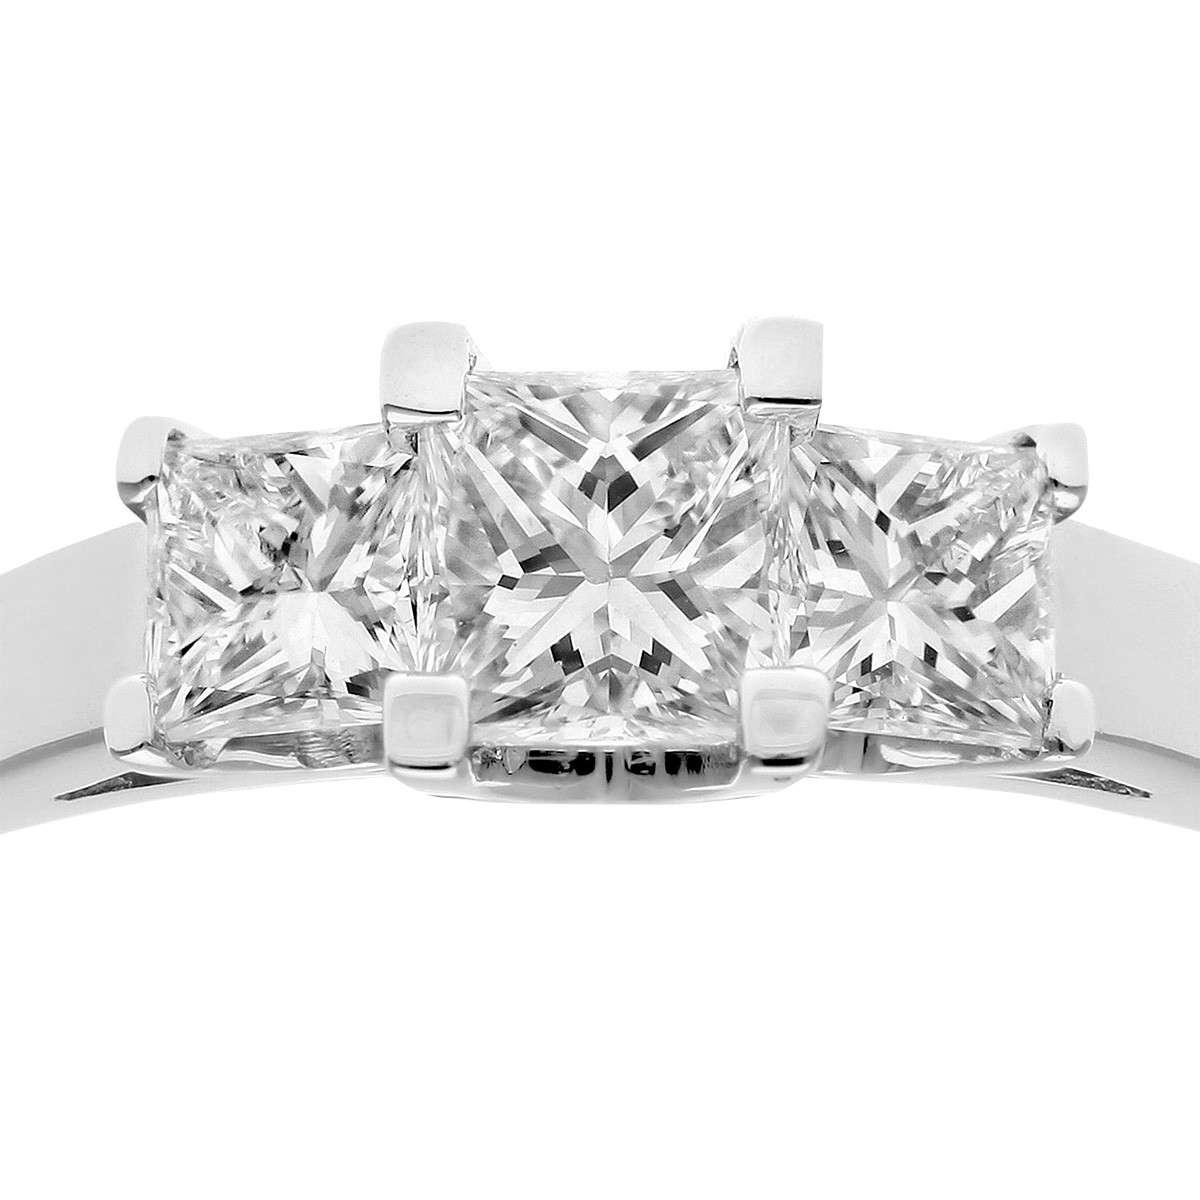 18CT WHITE GOLD 1.00CT DIAMOND PRINCESS CUT 3 STONE RING